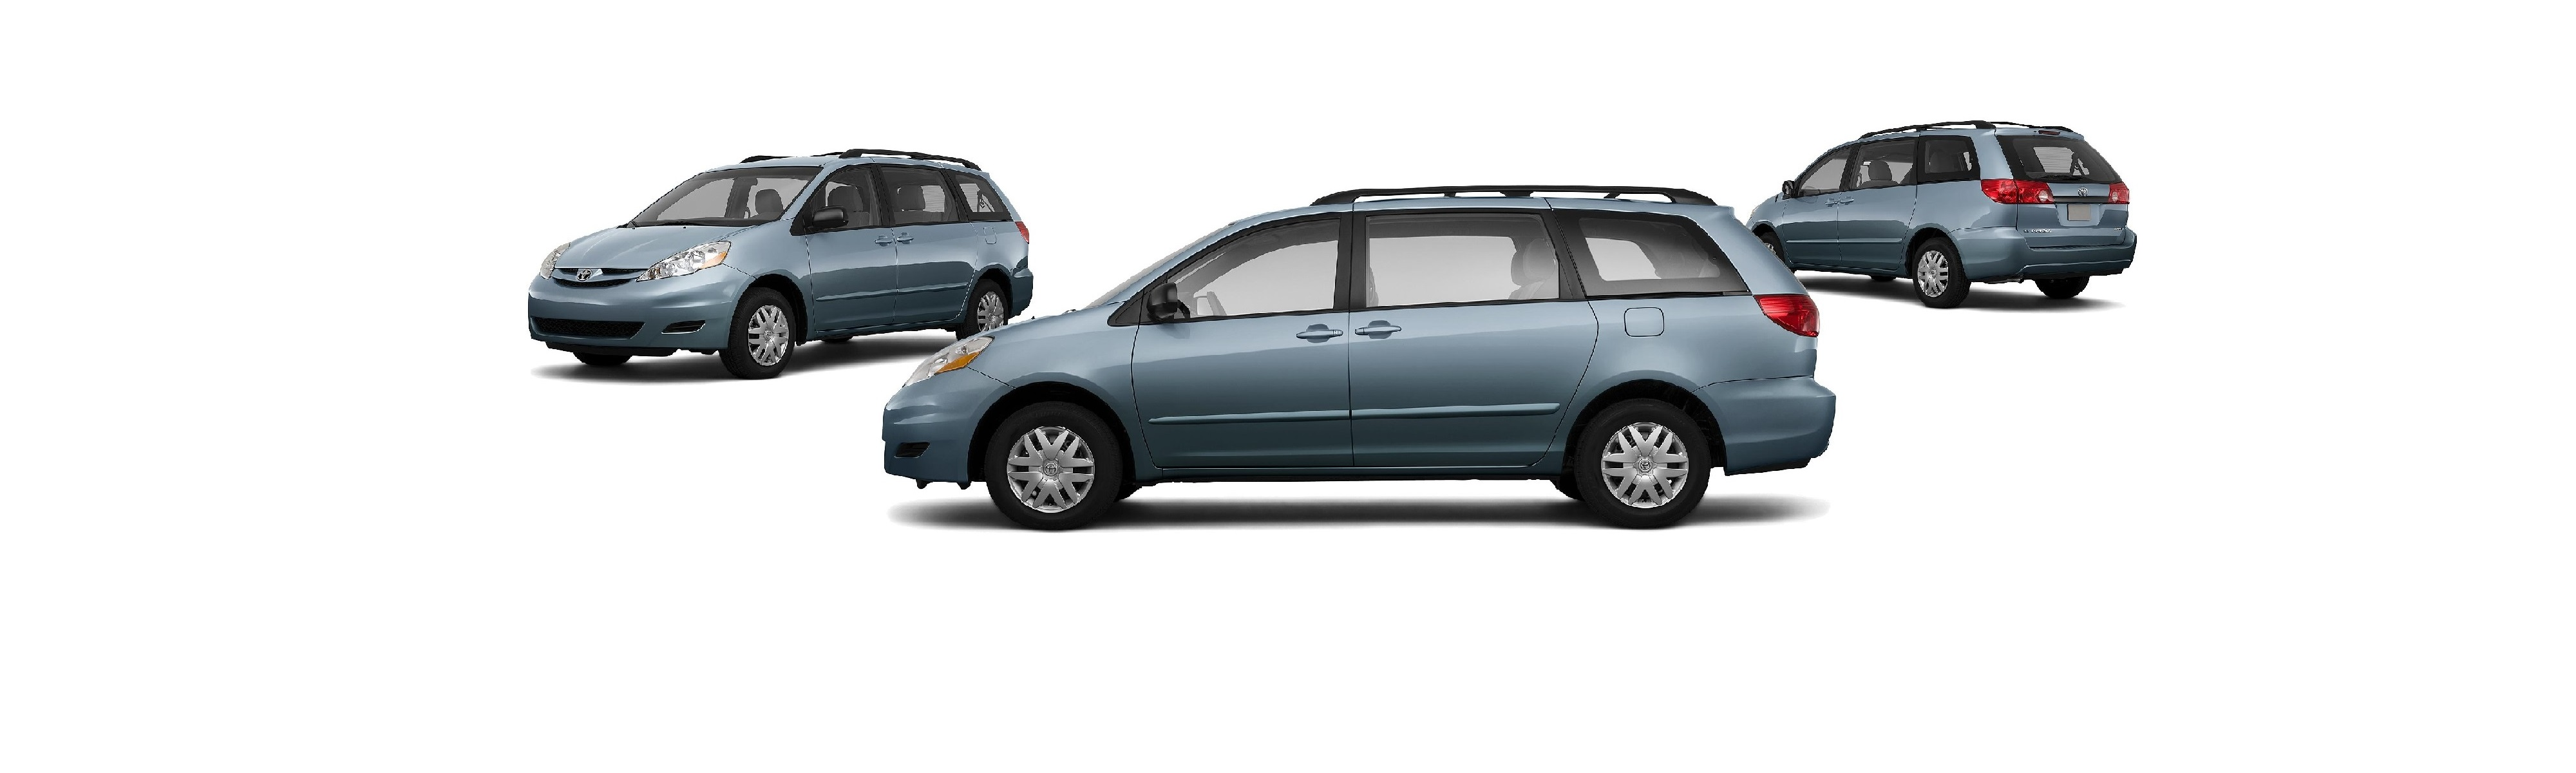 2010-toyota-sienna-ce-7-passenger-4dr-mini-van-blue-mirage-metallic-composite-large